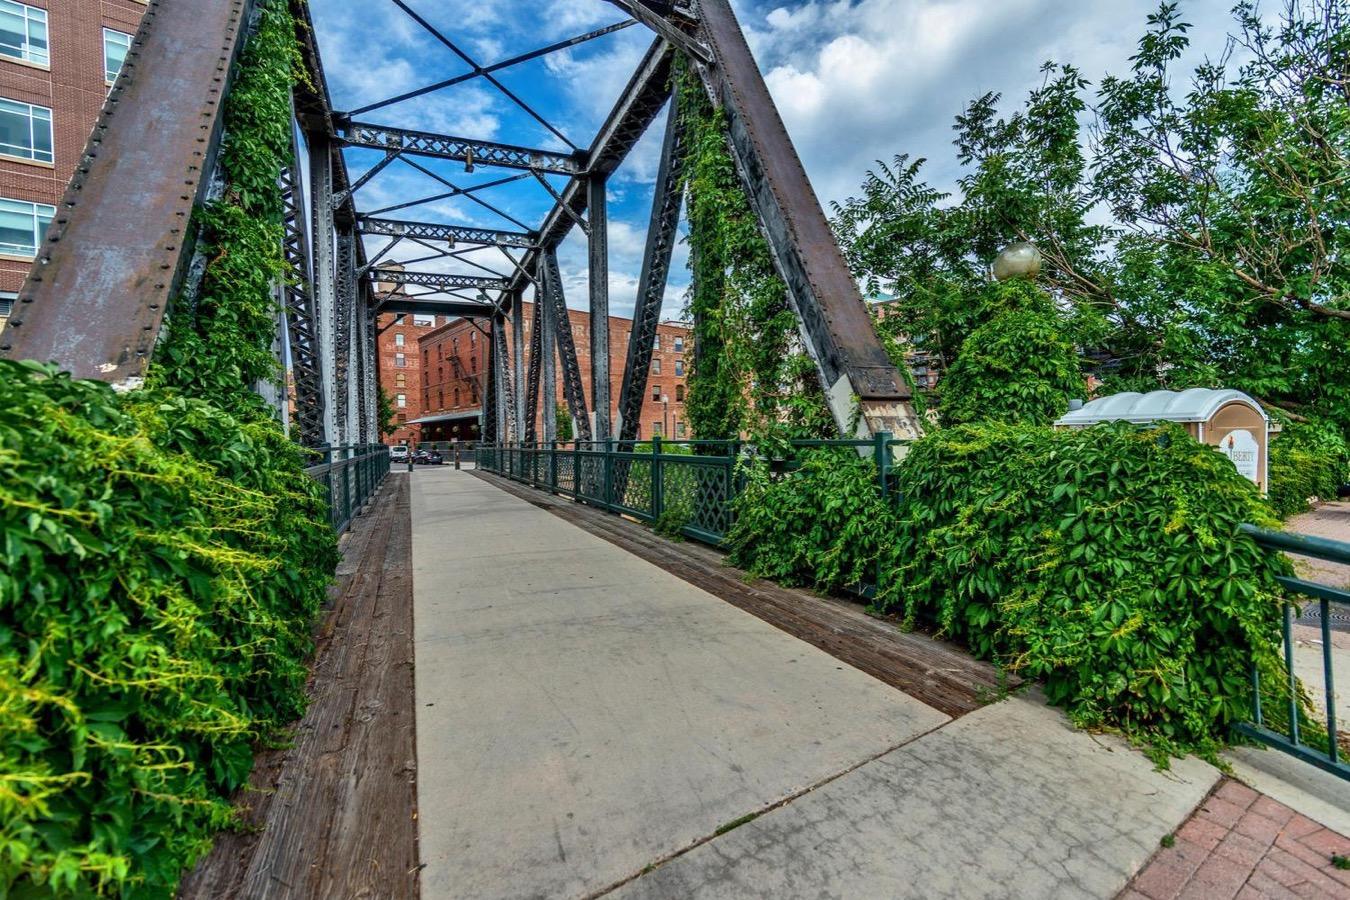 Steelbridge & Cherry Creek Trail